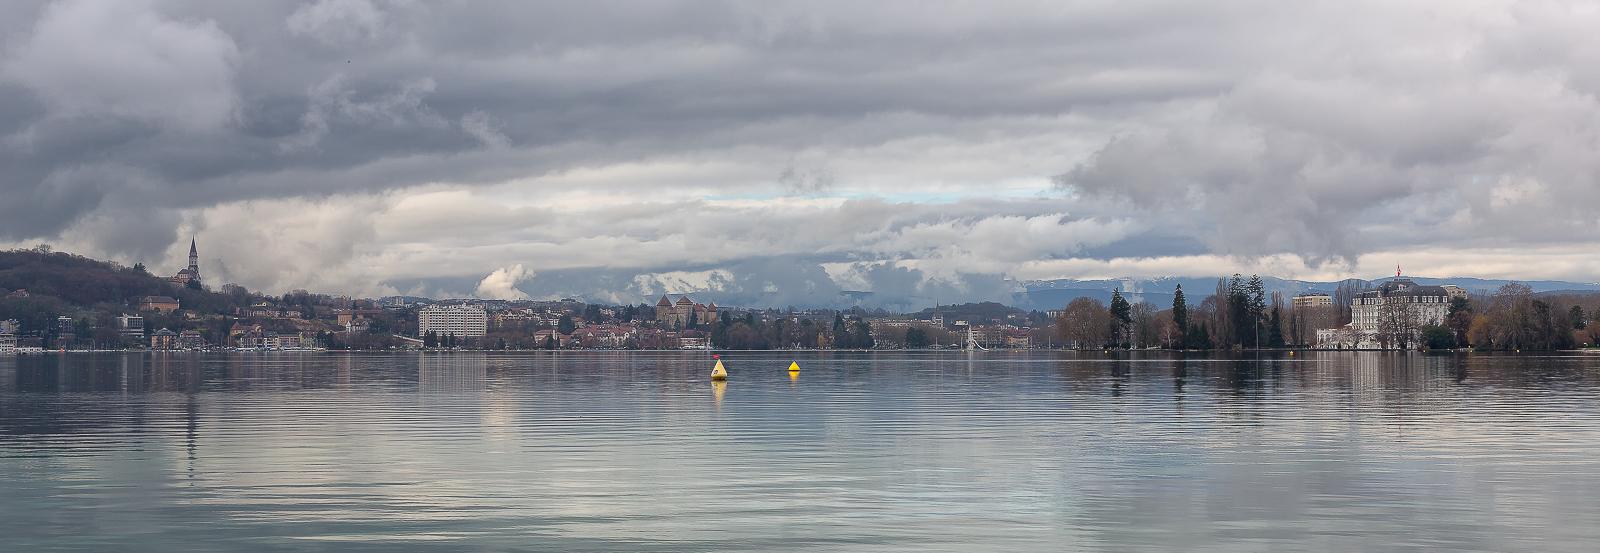 EF 50mm f/1,4 Les berges d'Annecy